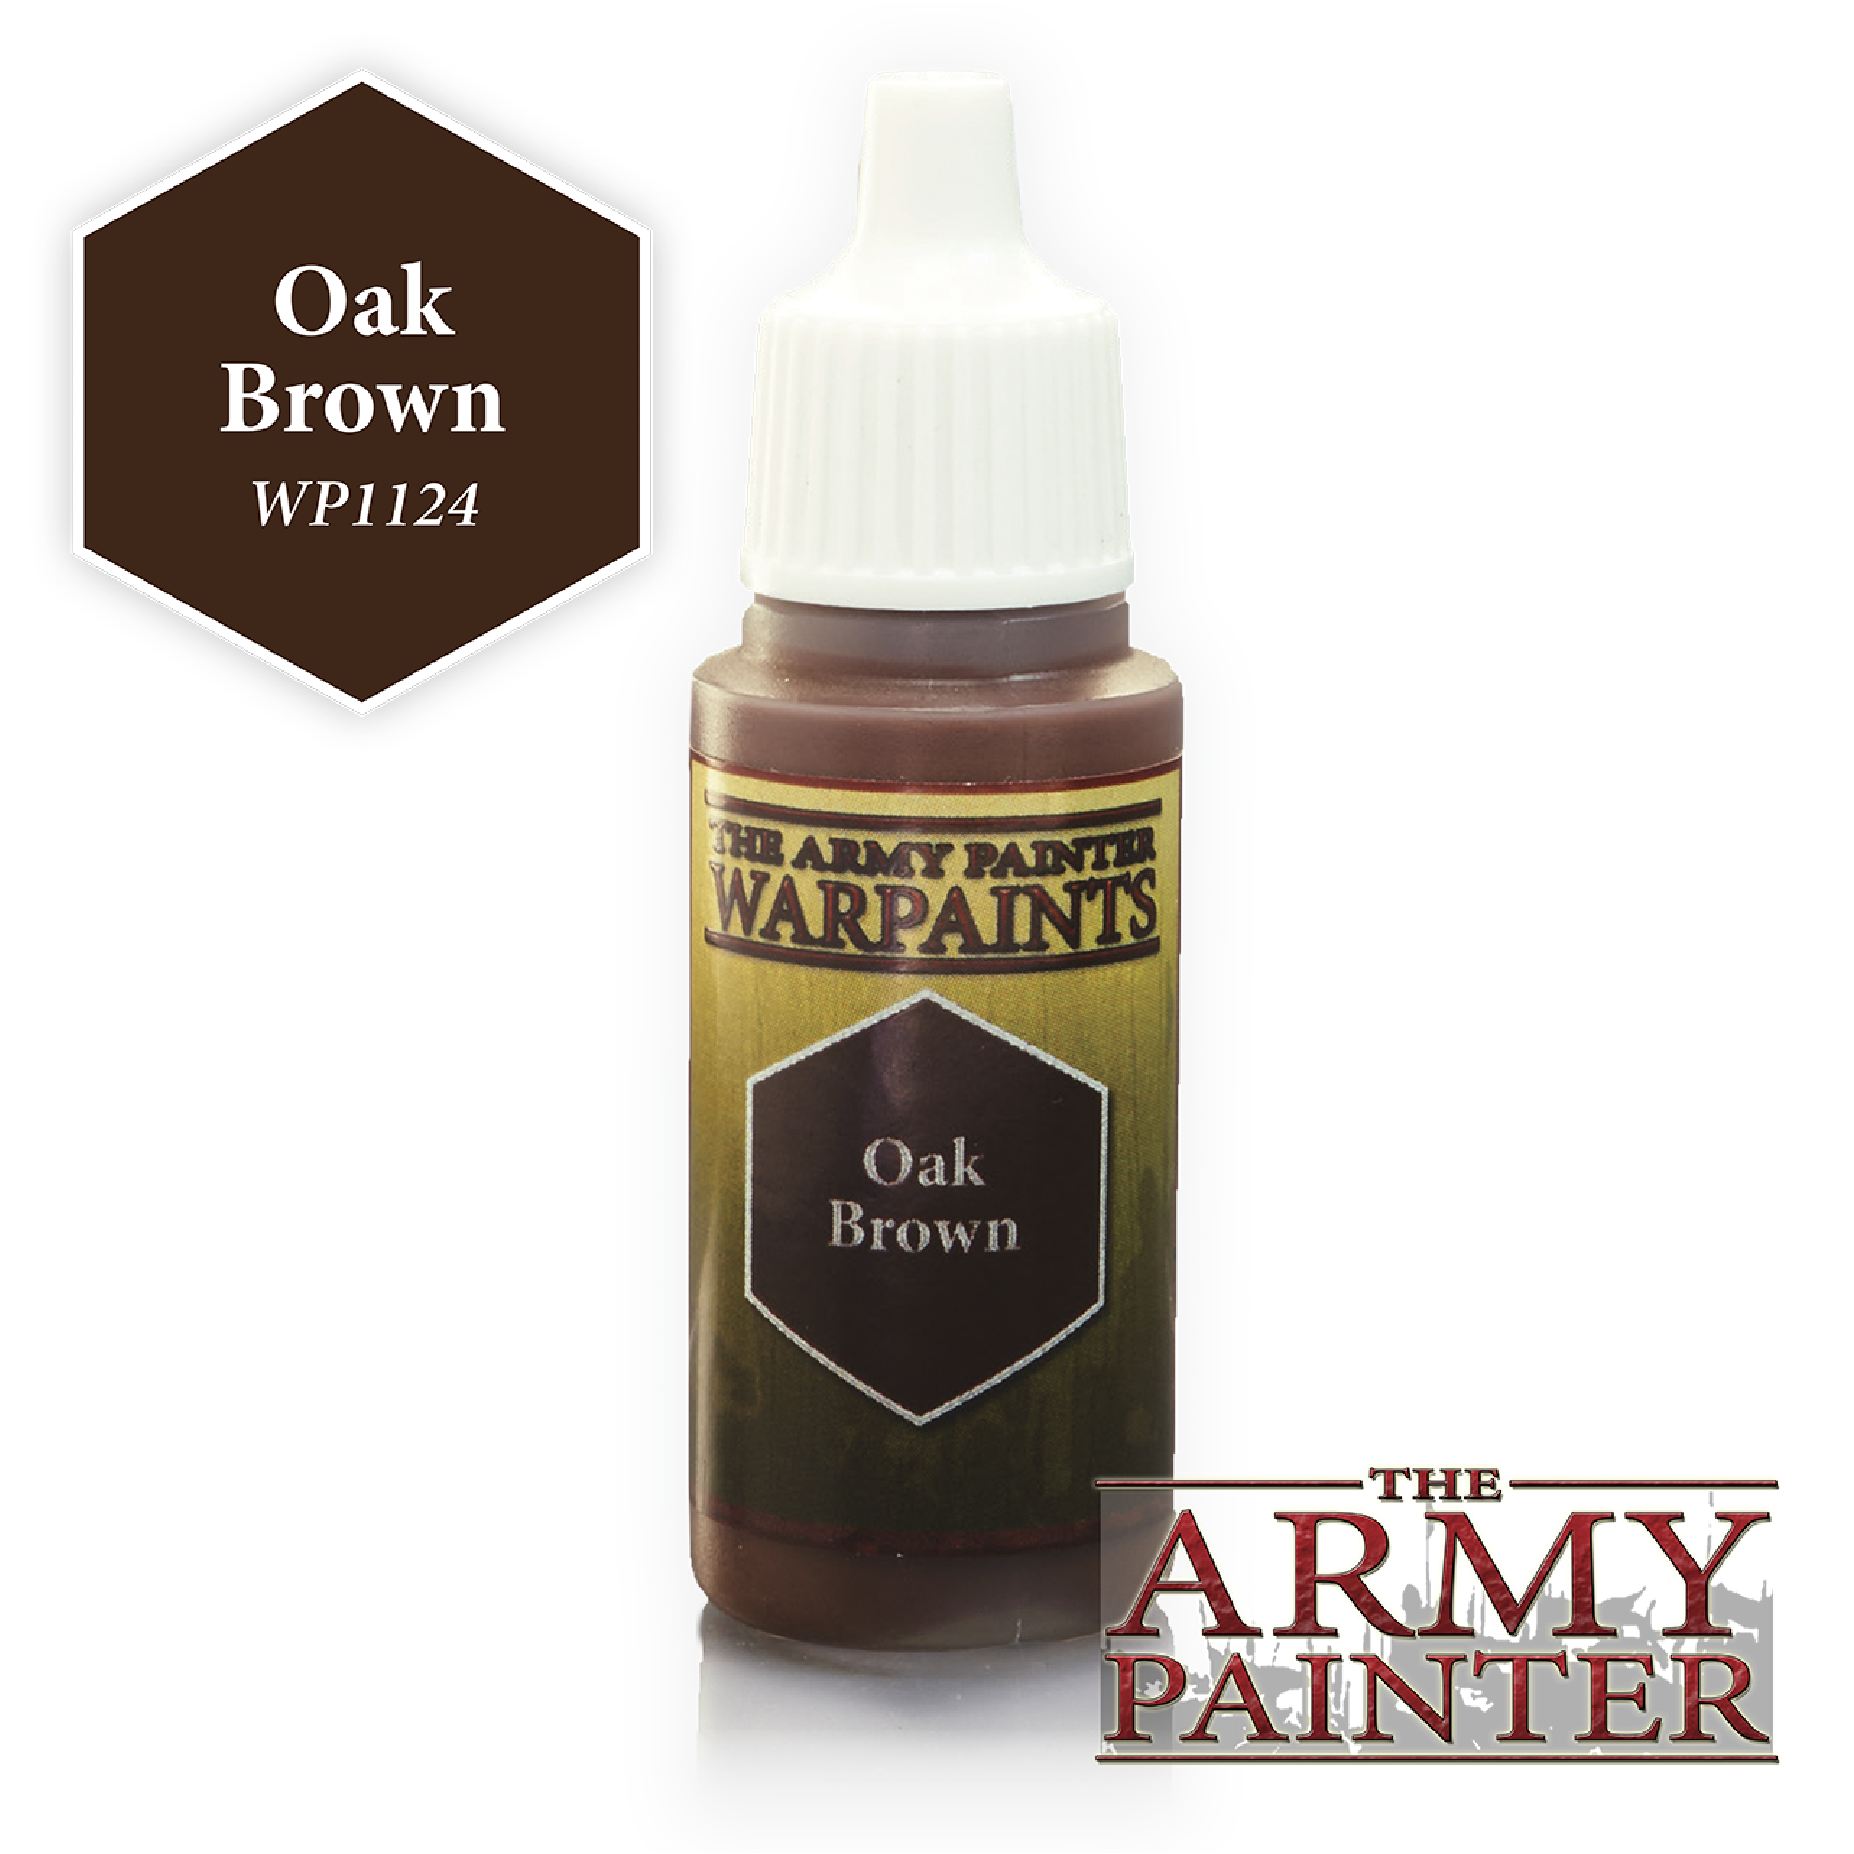 Army Painter Warpaint - Oak Brown